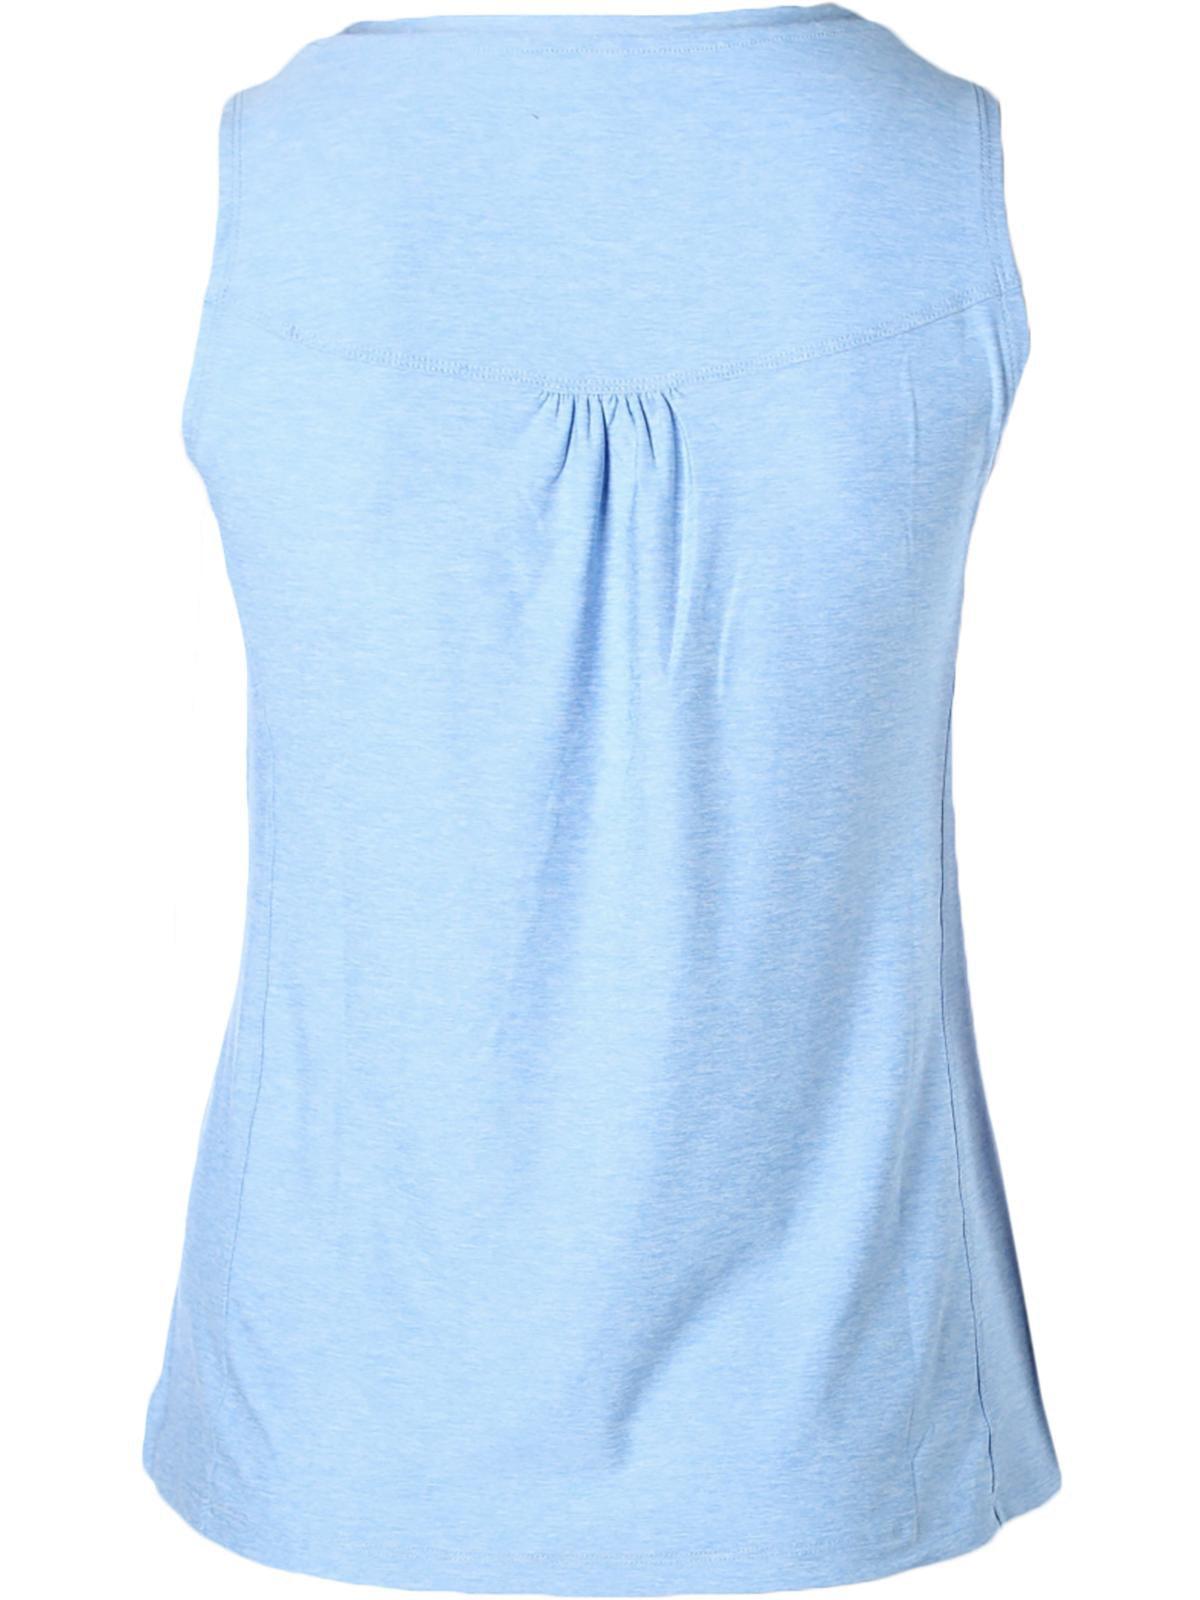 db75d2a1a6e Marika Curves - Marika Curves Womens Plus Riley Quick Dry Printed Tank Top  - Walmart.com